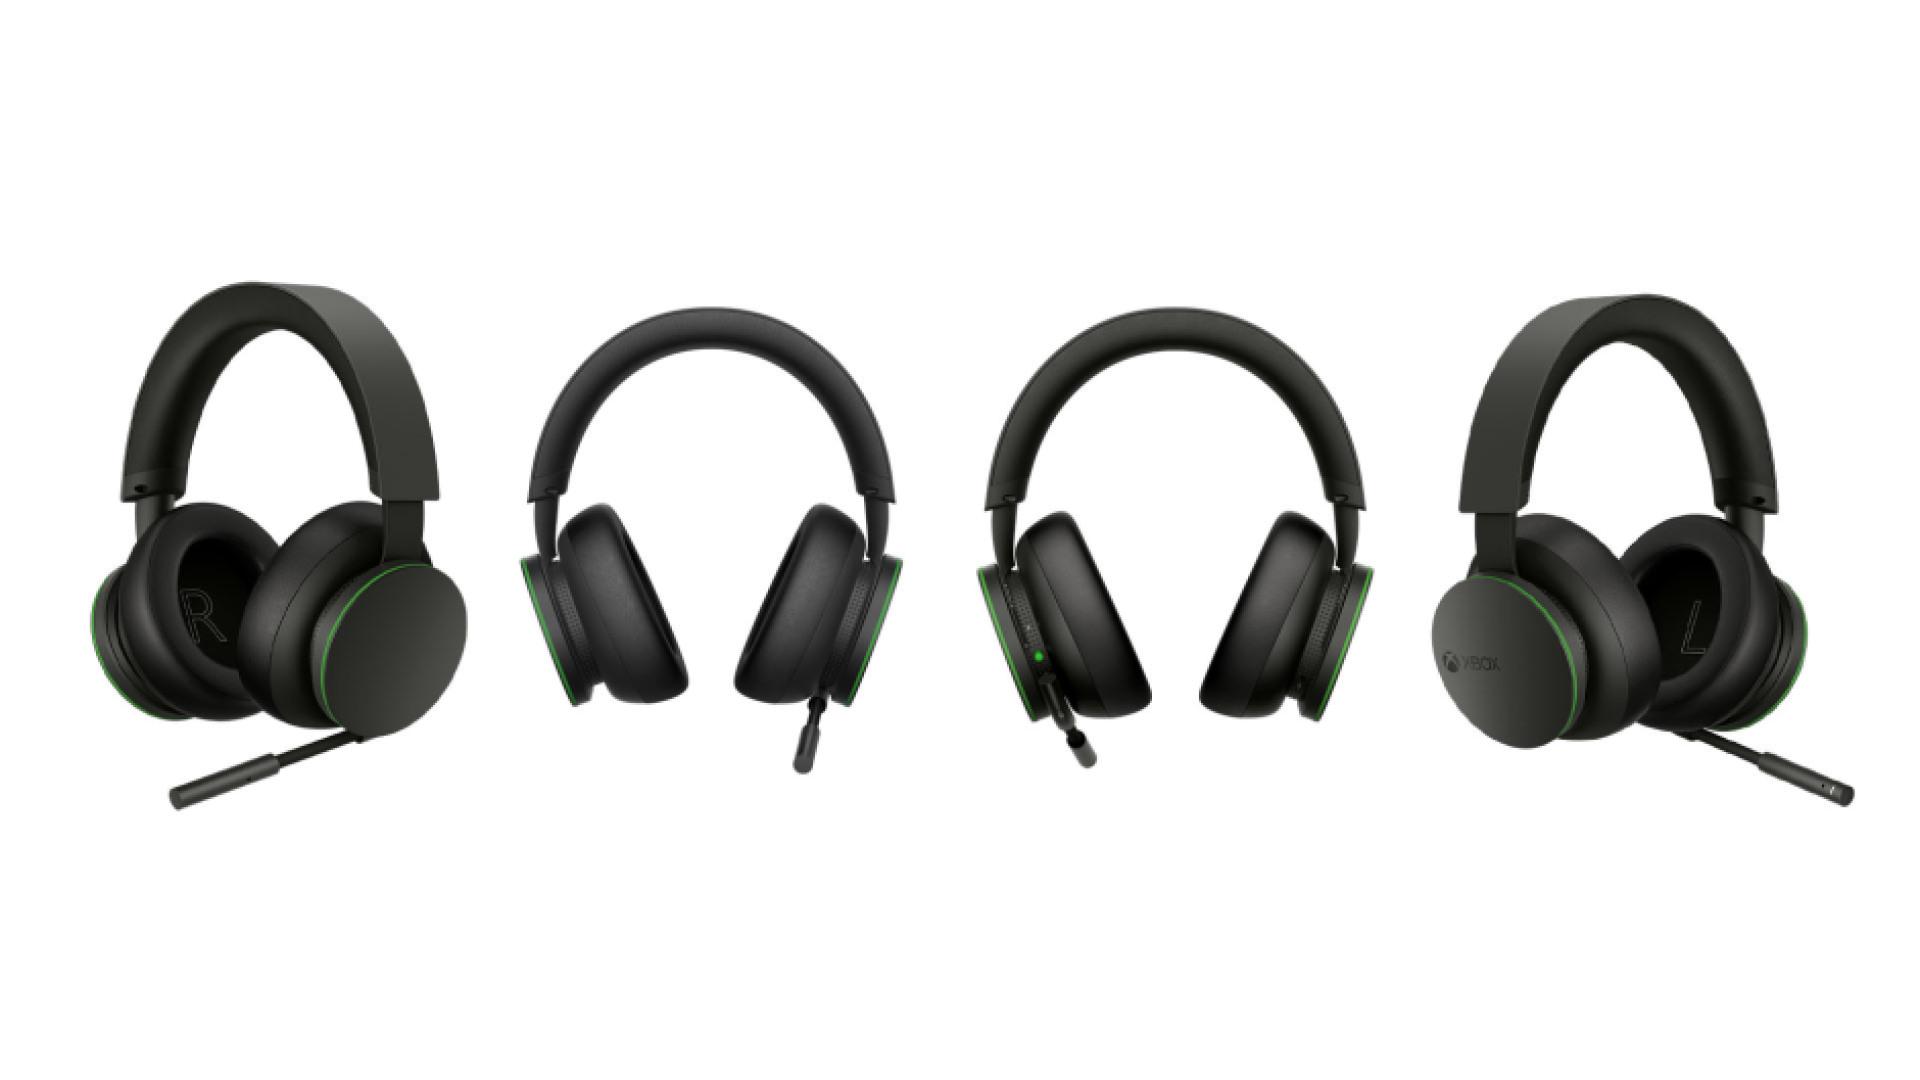 Xbox One Wireless Headset Bluescreen XboxWire_WirelessHeadset_RendersAsset.jpg